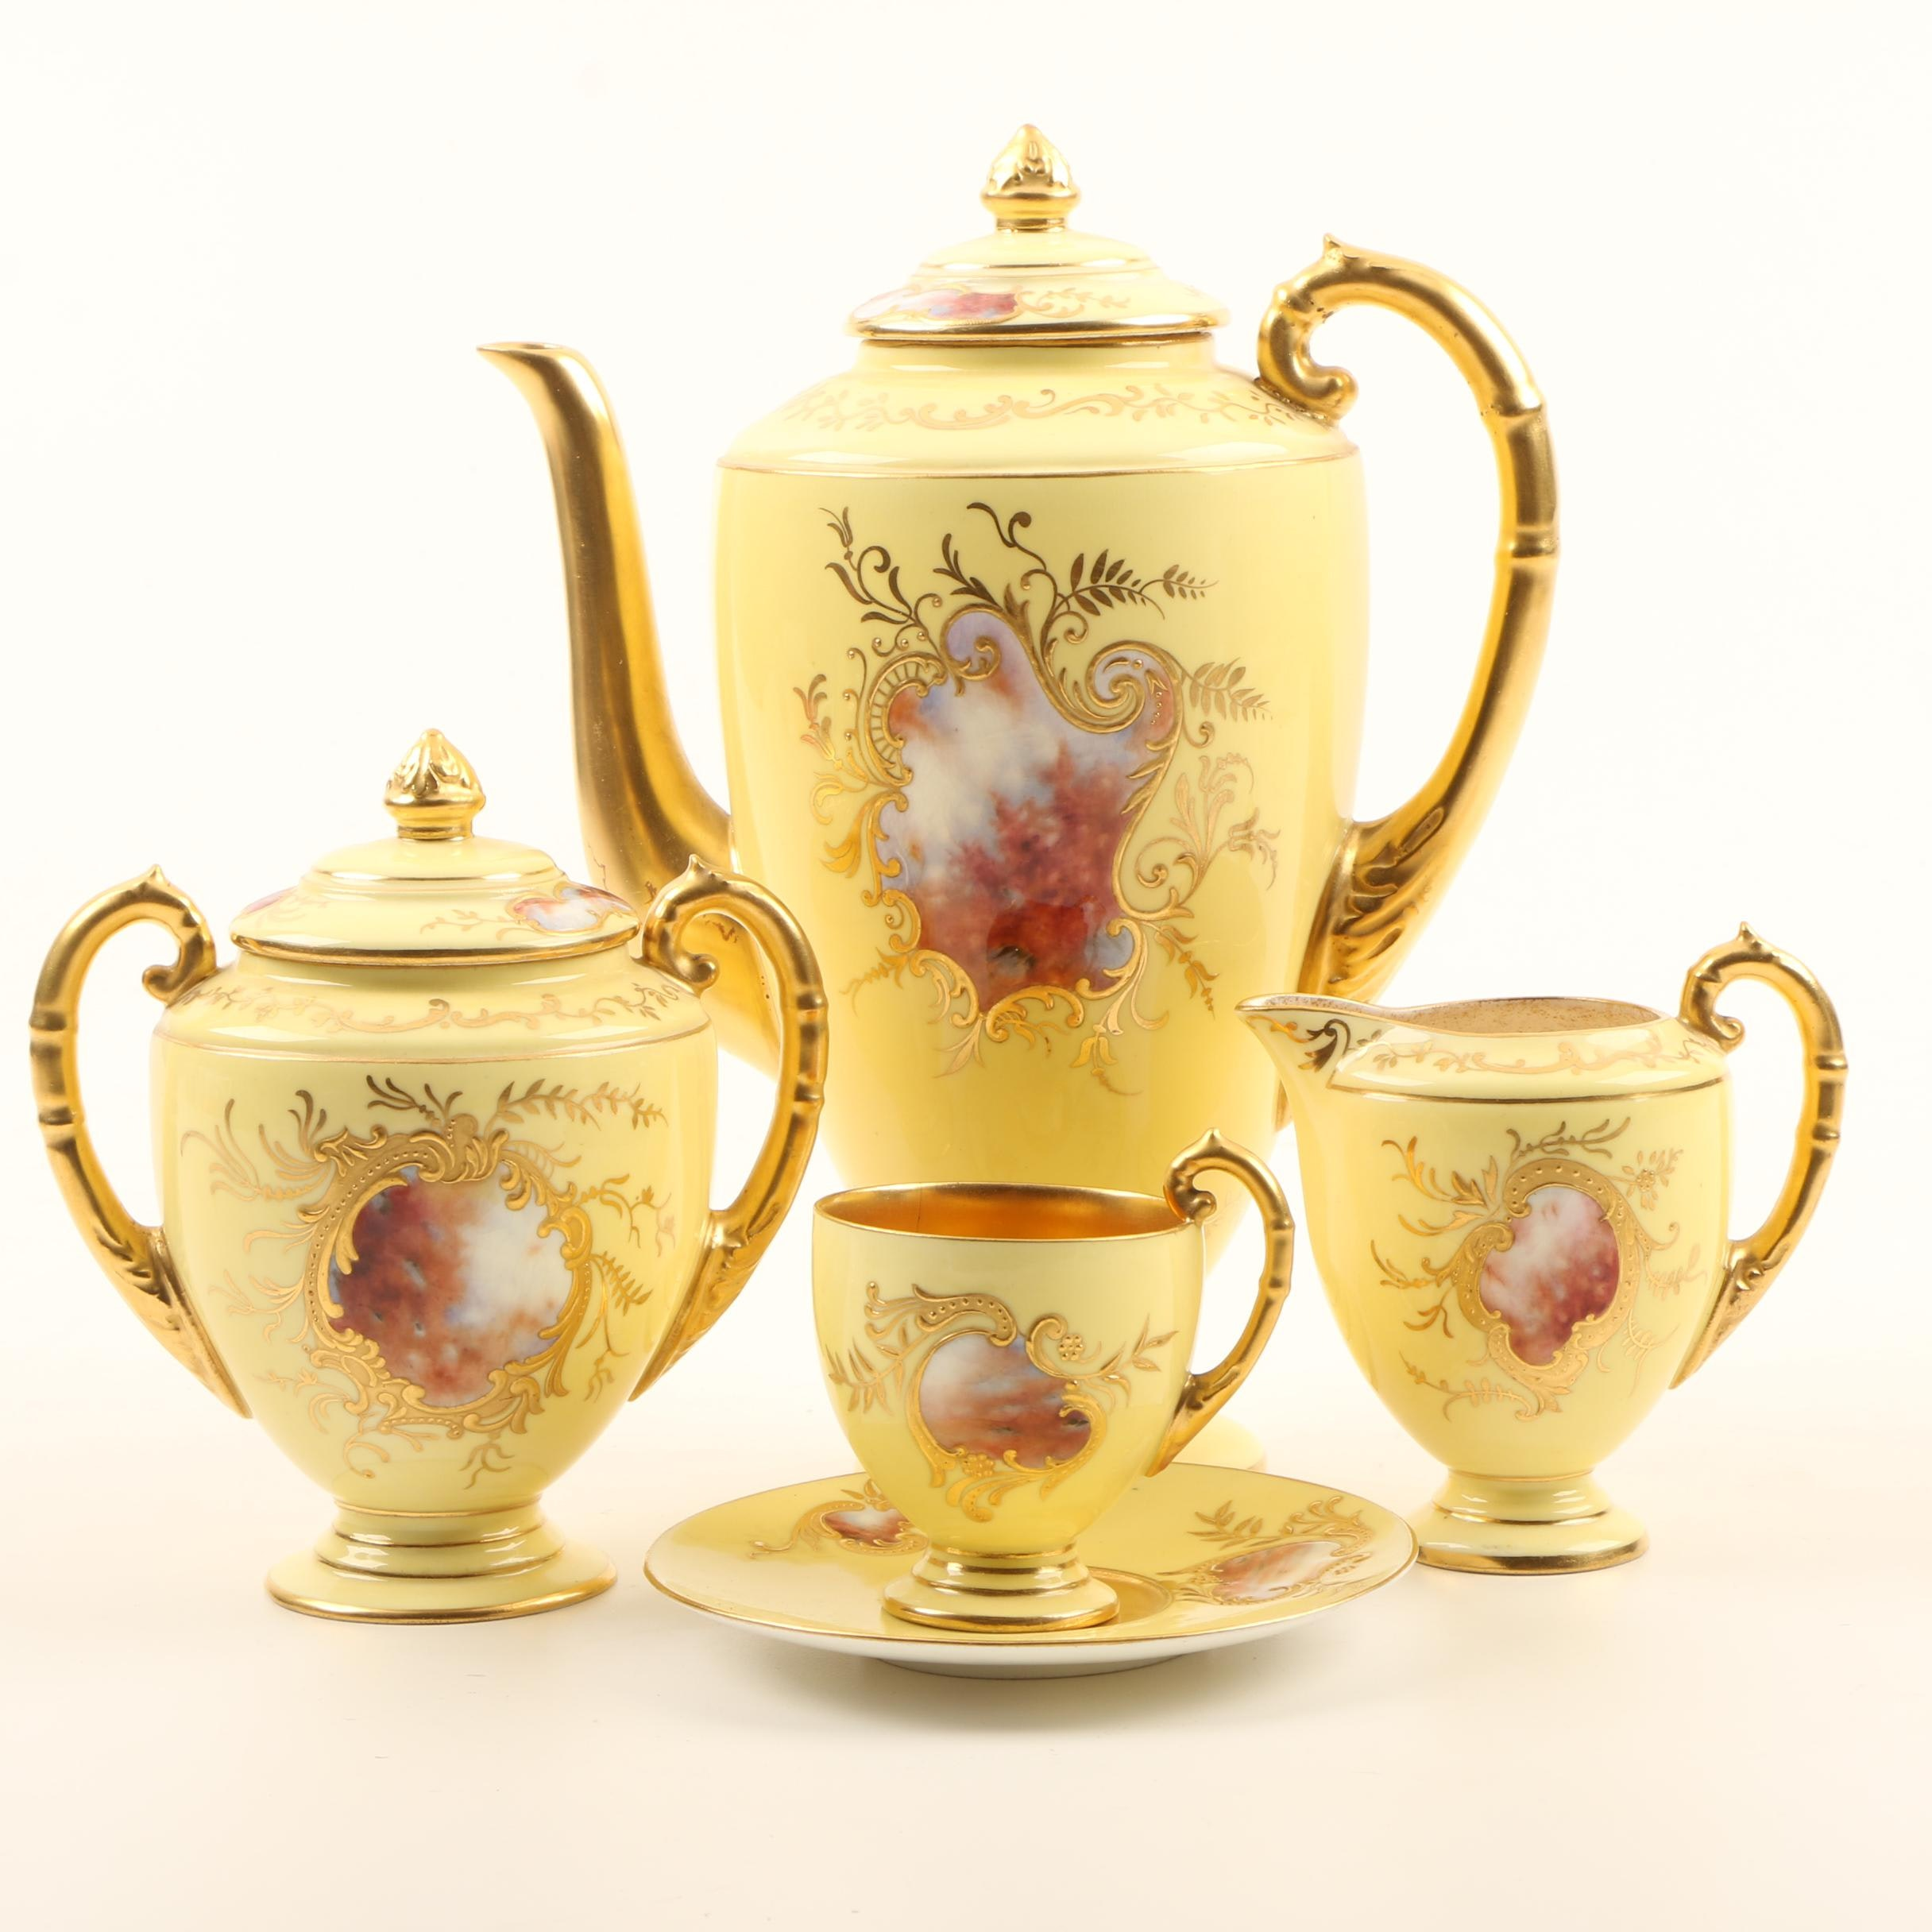 Early 20th Century English Coalport China Coffee Service Set